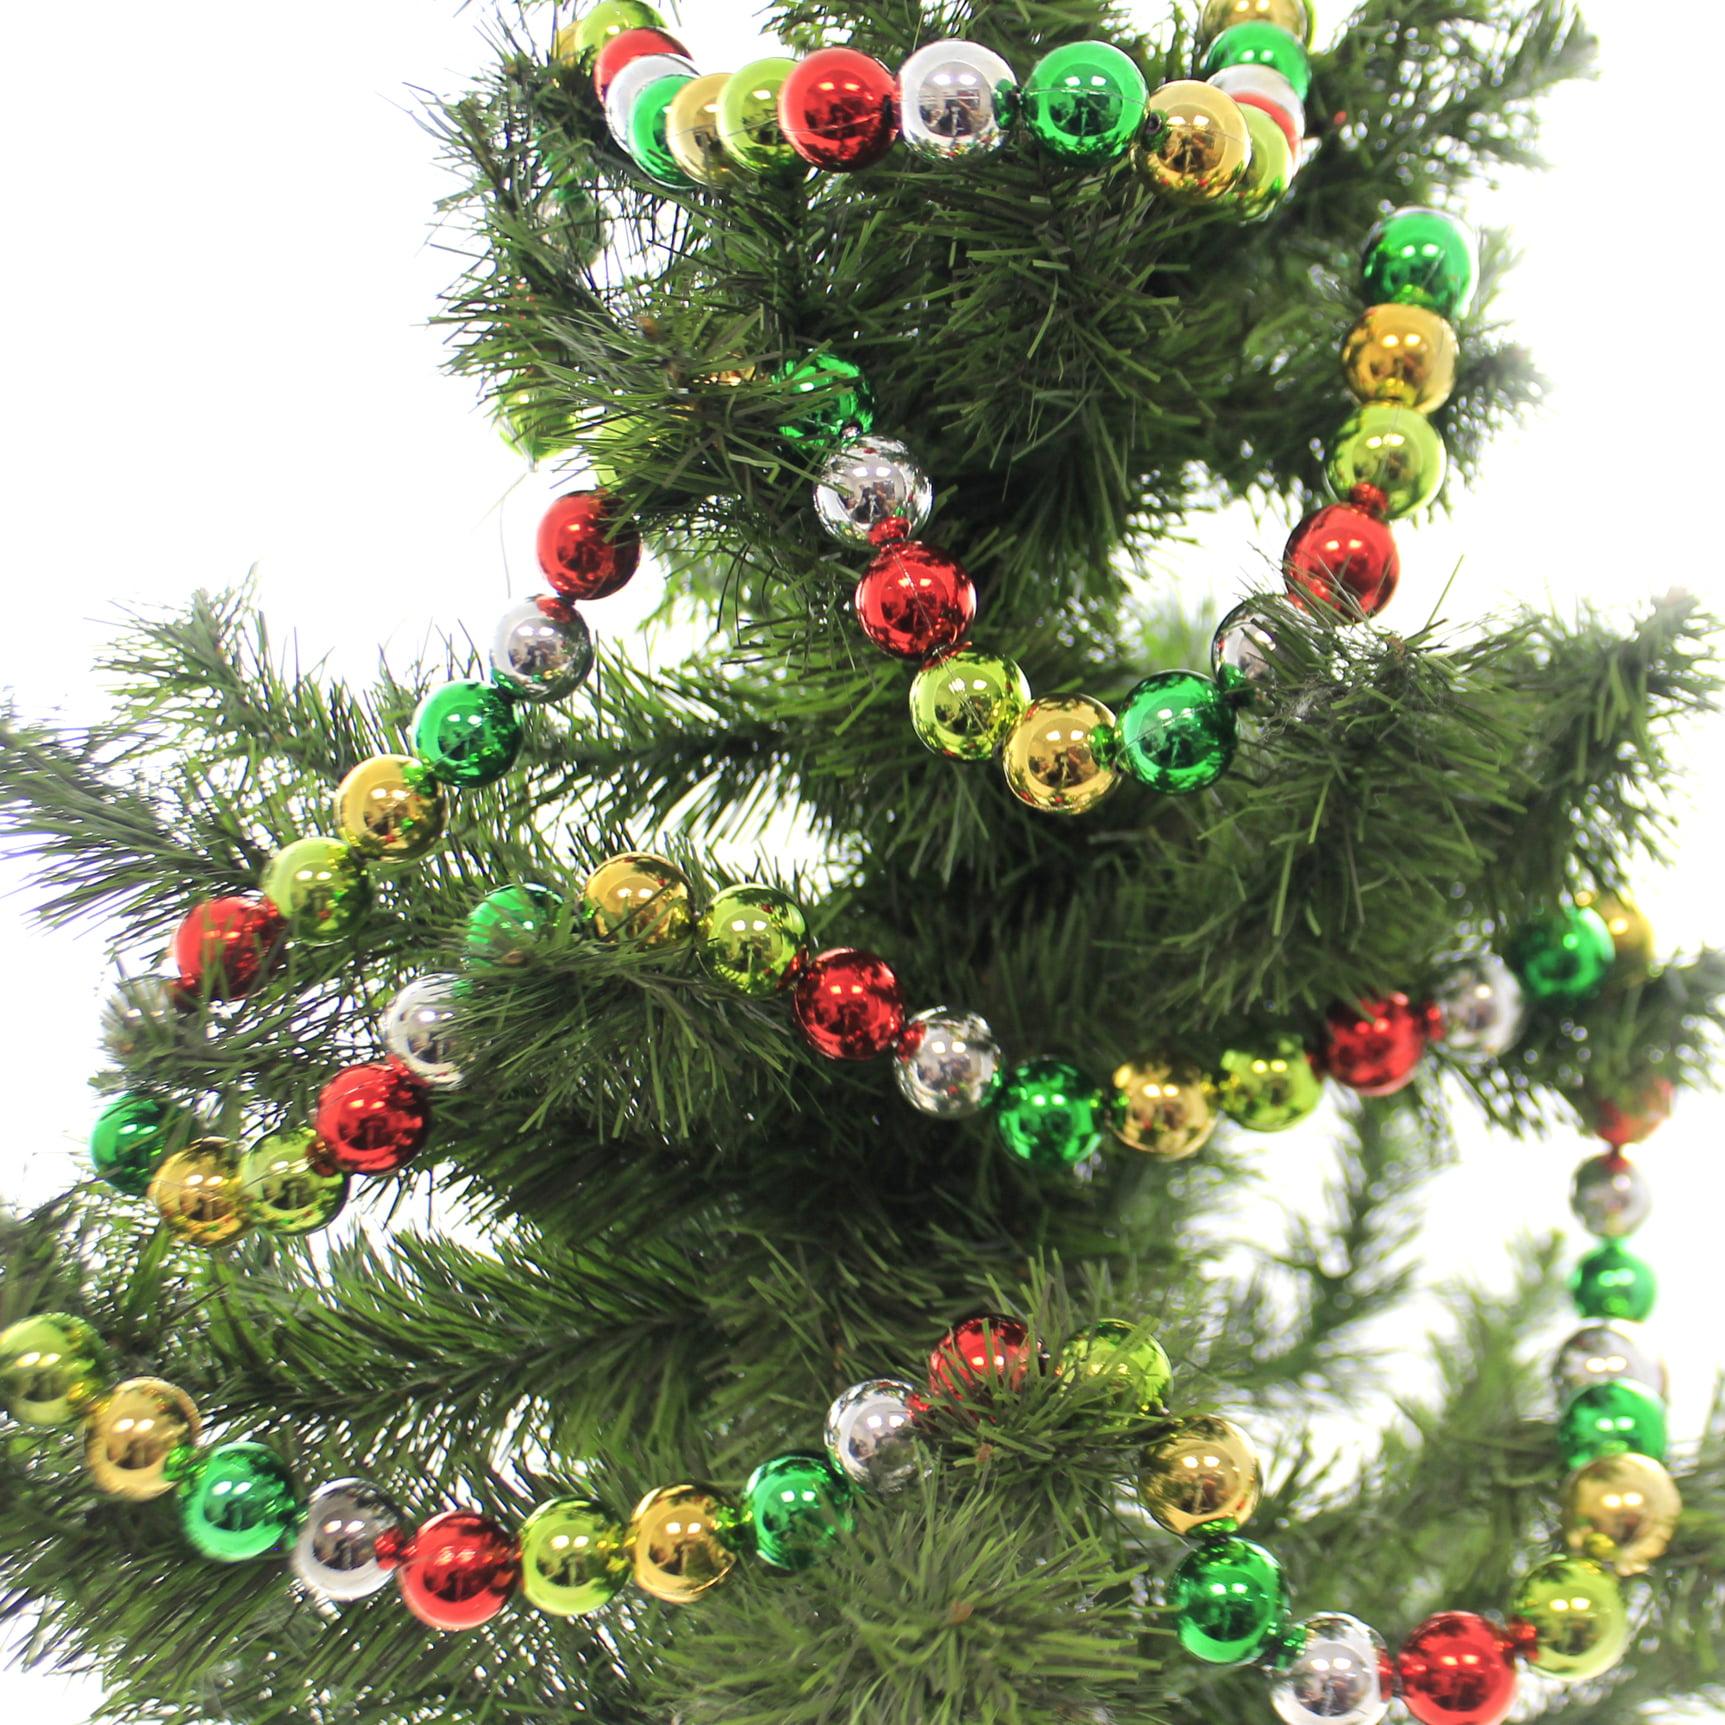 2021 Christmas Garland, Green Nude Garland, Christmas Decorations, Christmas Garlands, Raw